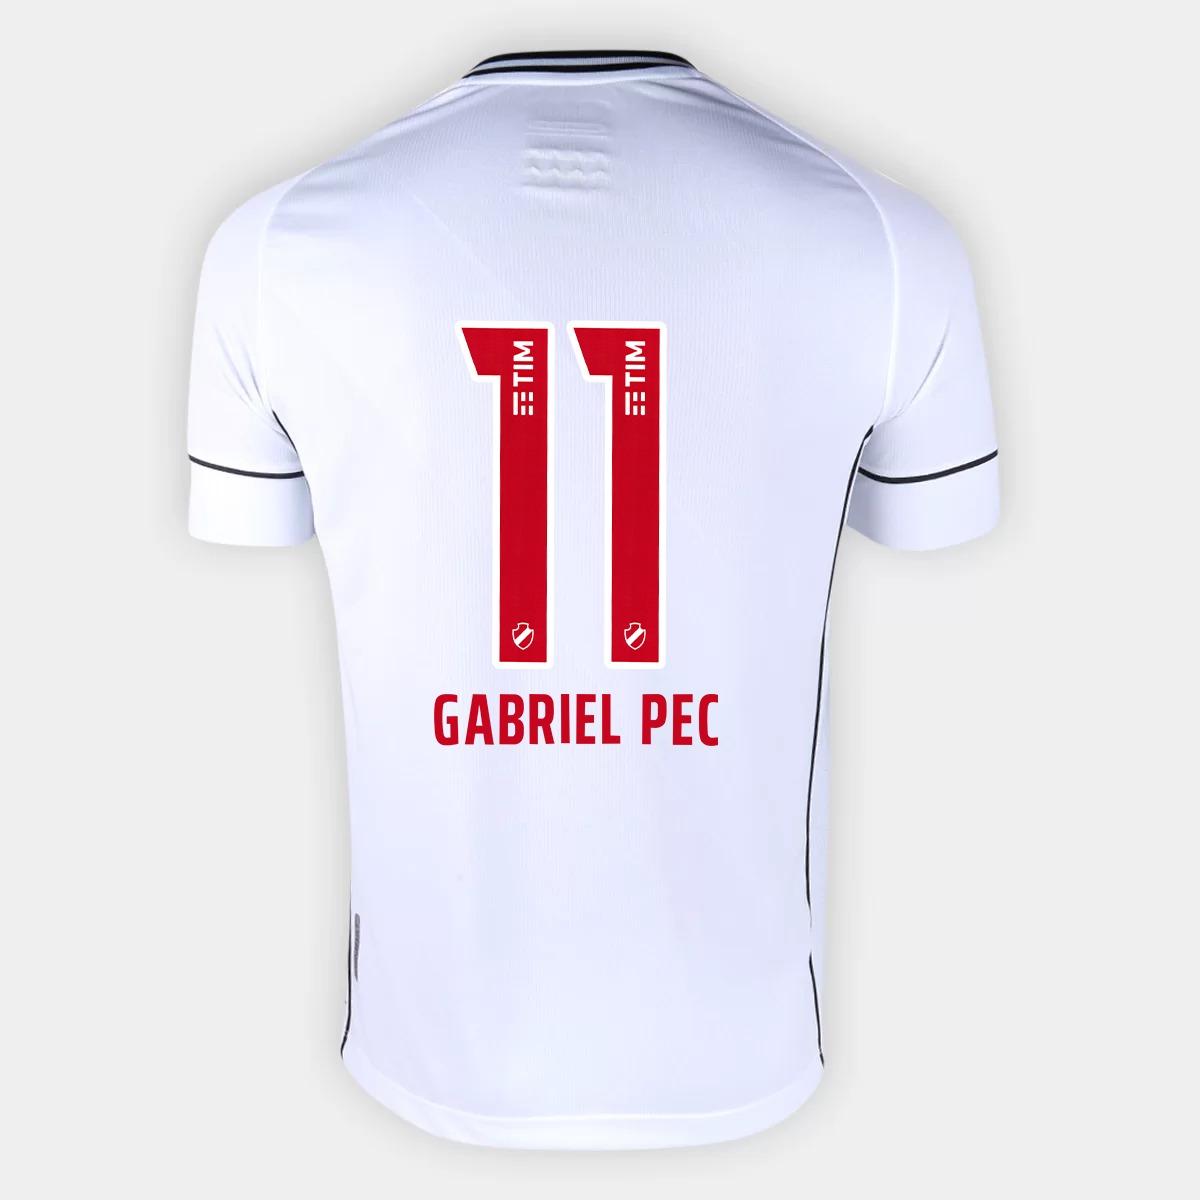 CAMISA VASCO II KAPPA 2020/2021 - Gabriel Peck